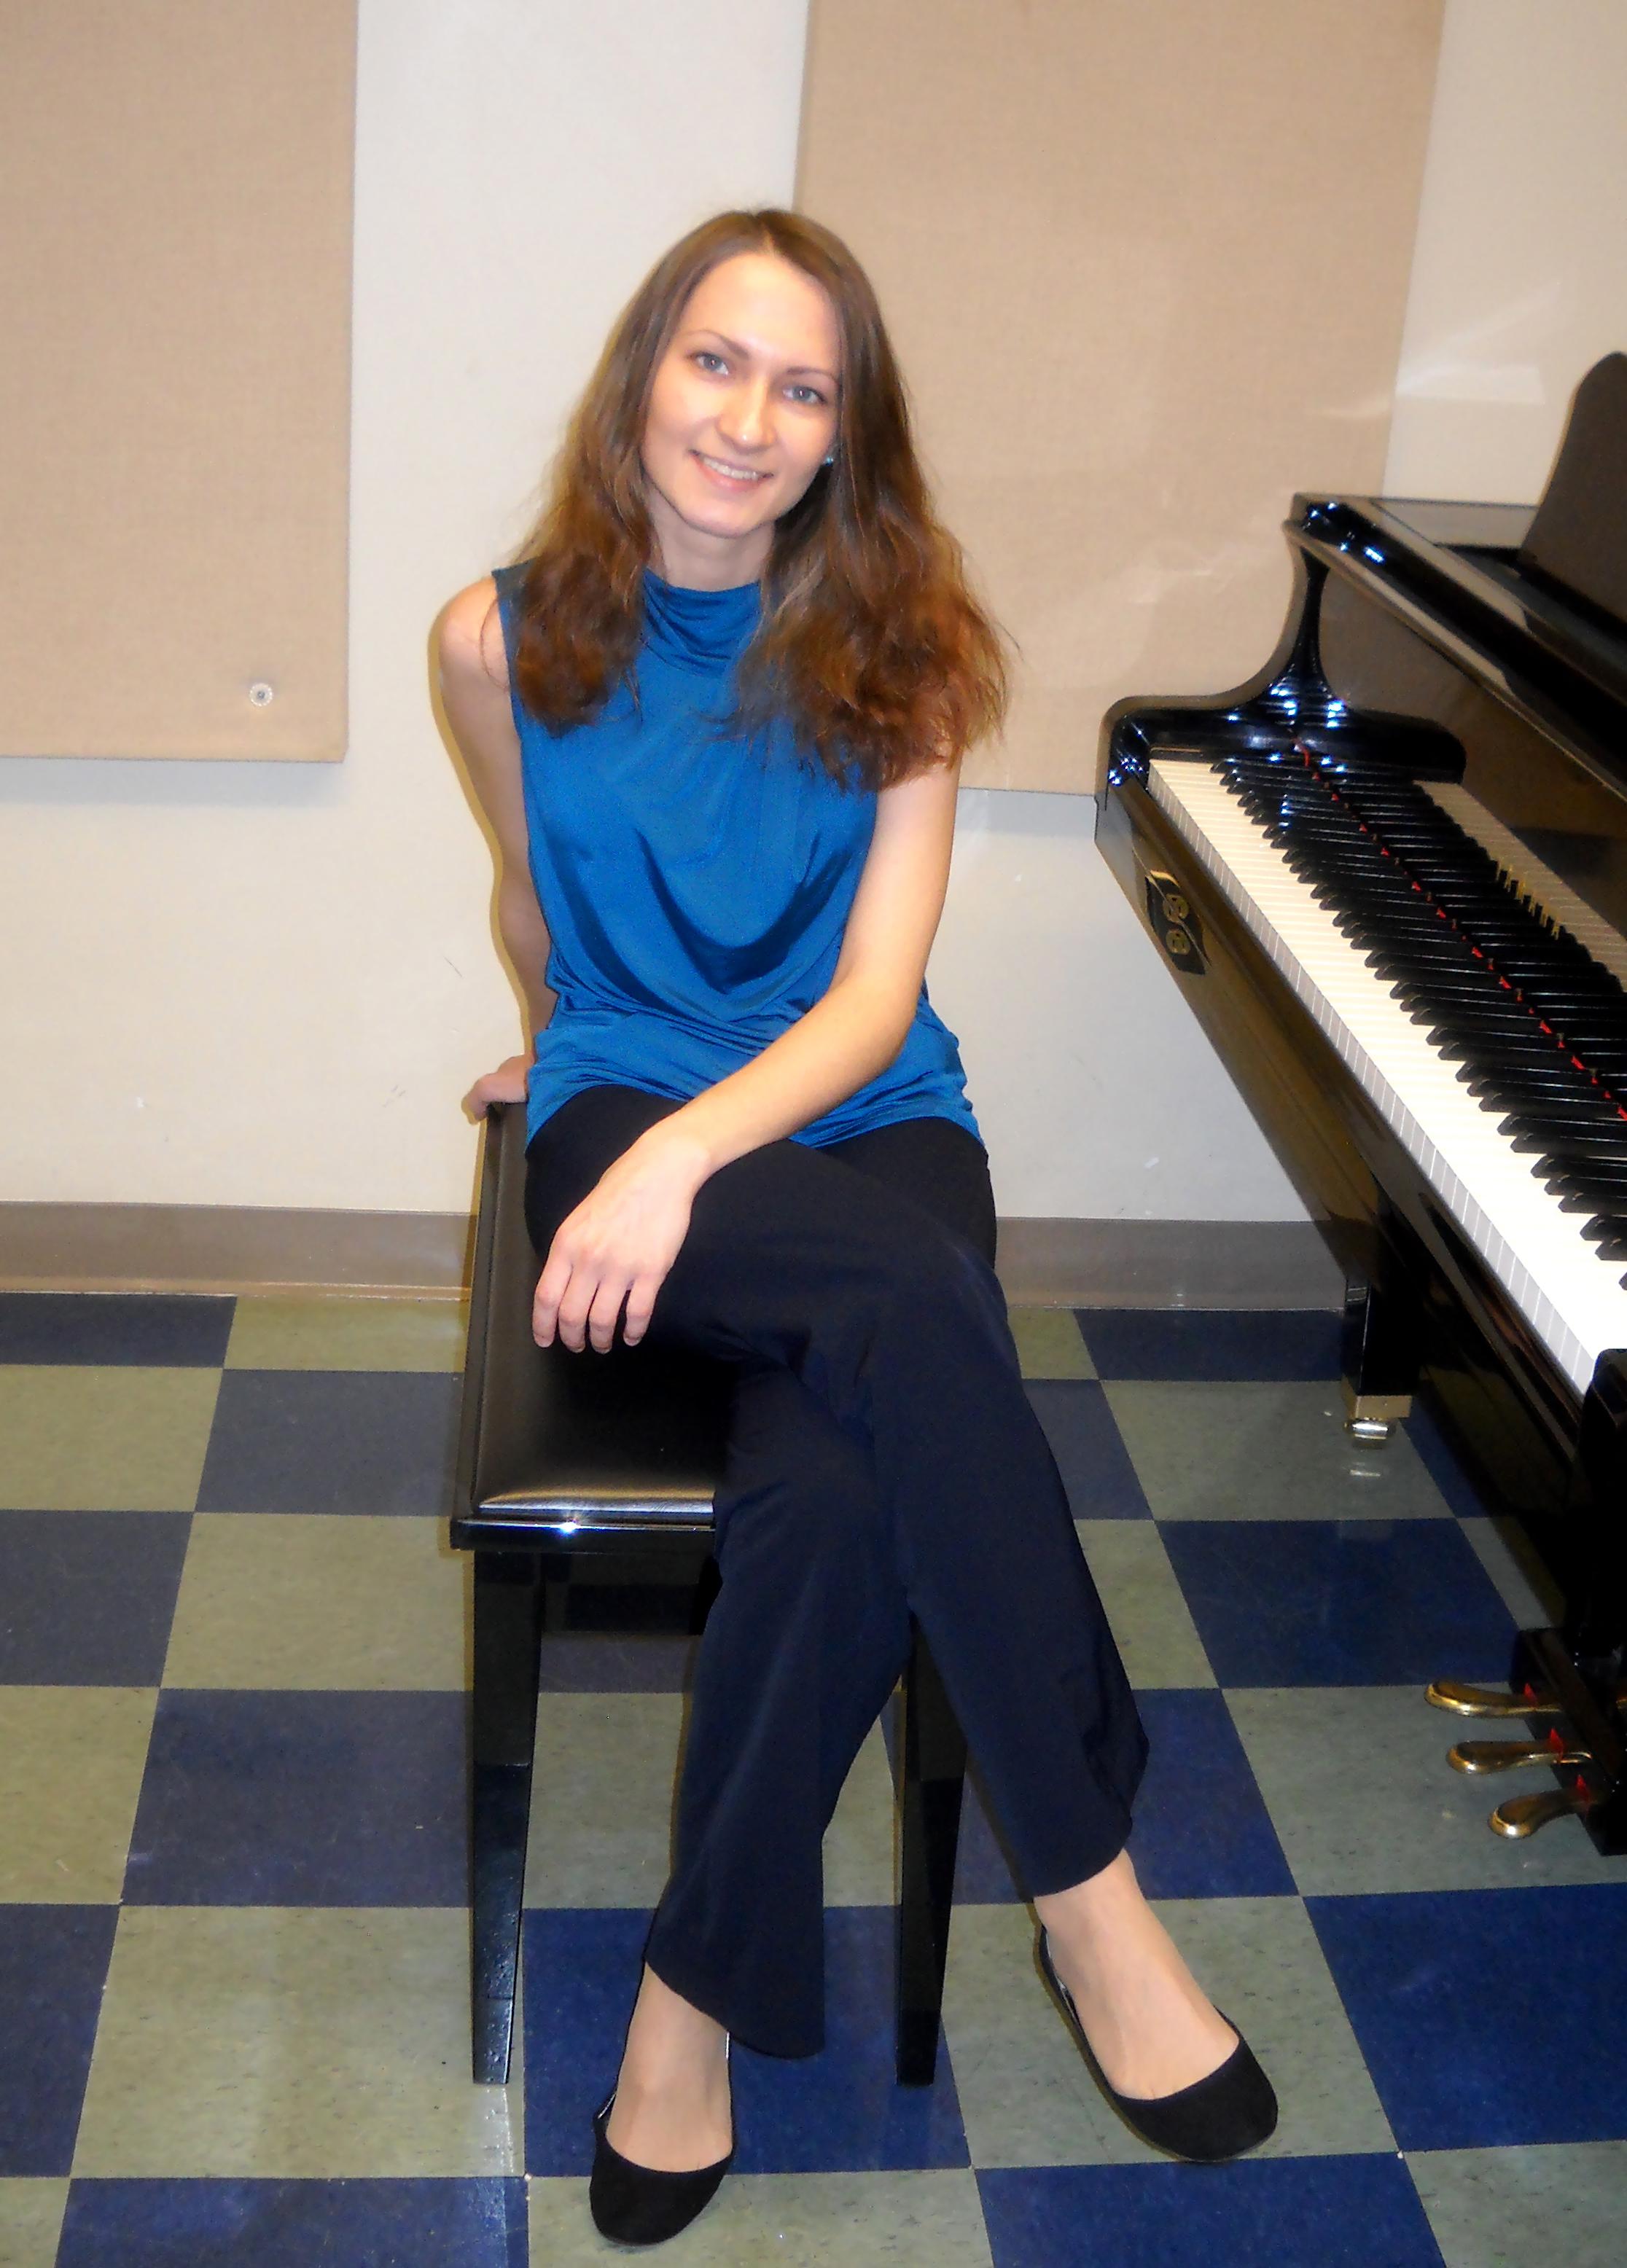 Pianist Ksenia Kurenysheva